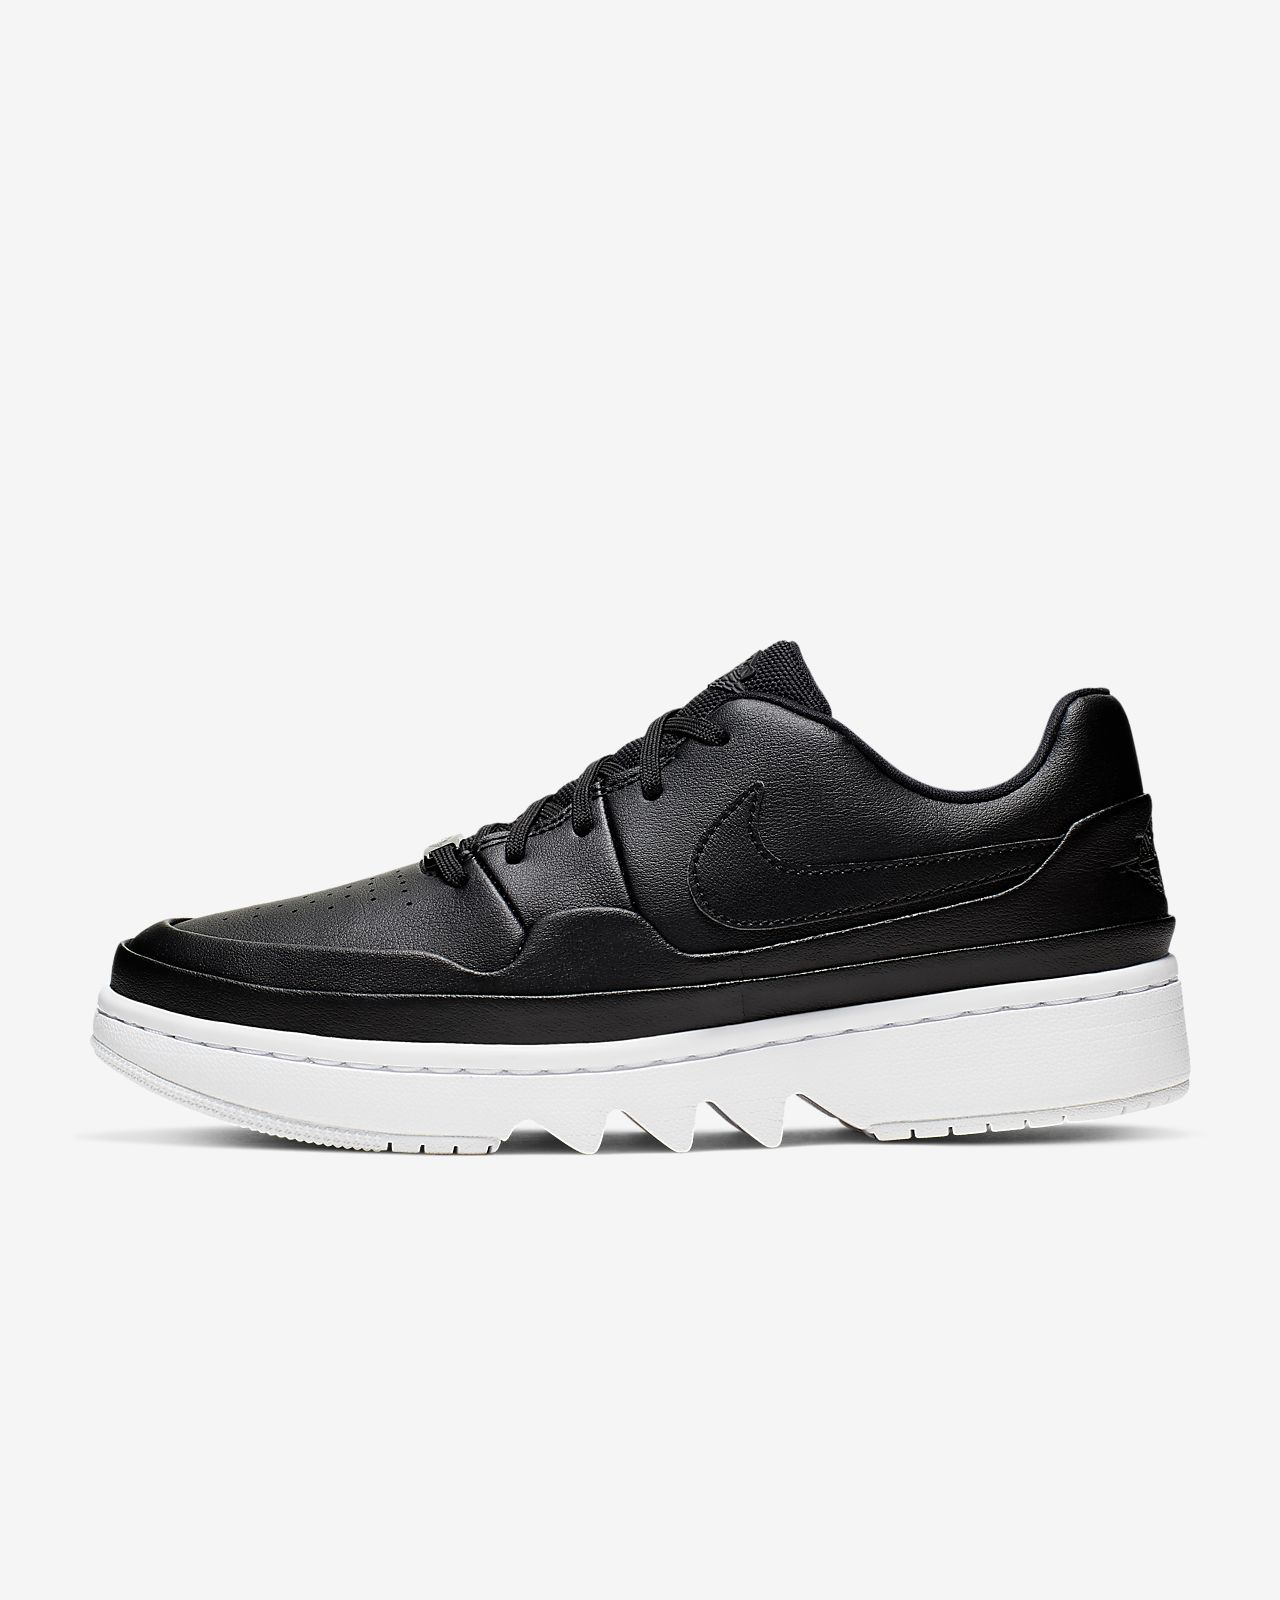 Air Jordan 1 Jester XX Low Laced 女鞋